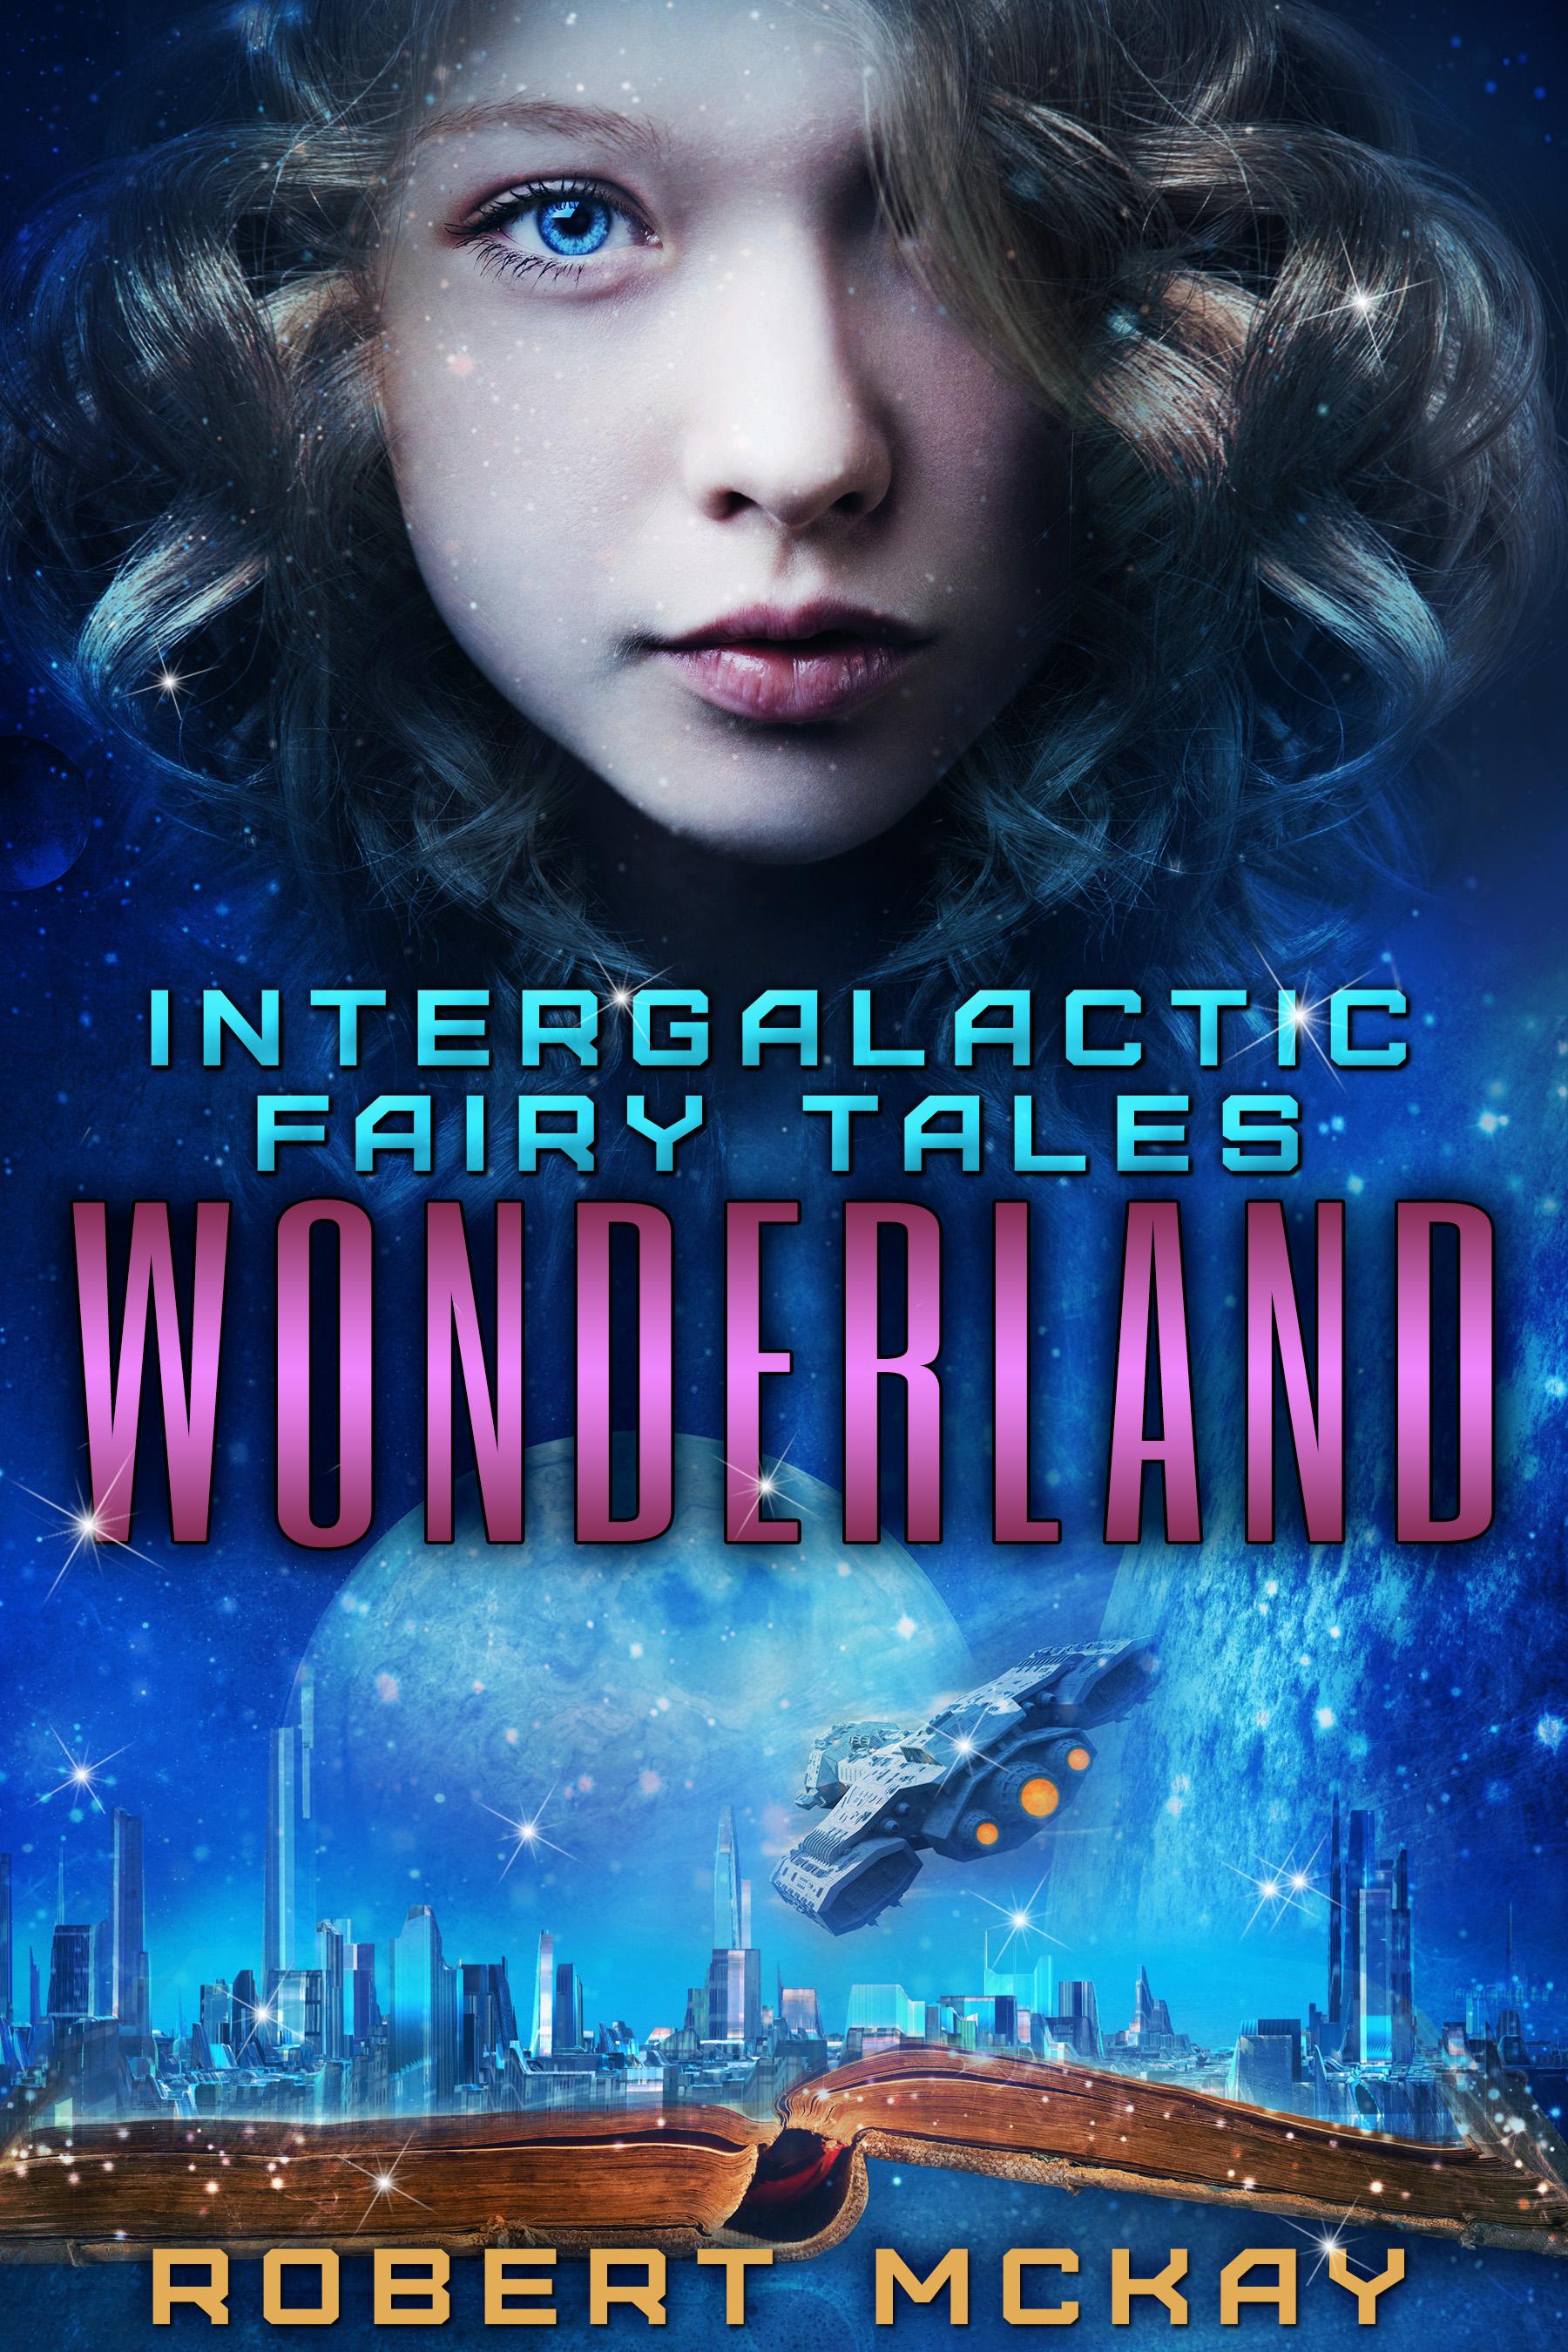 Wonderland by Robert McKay